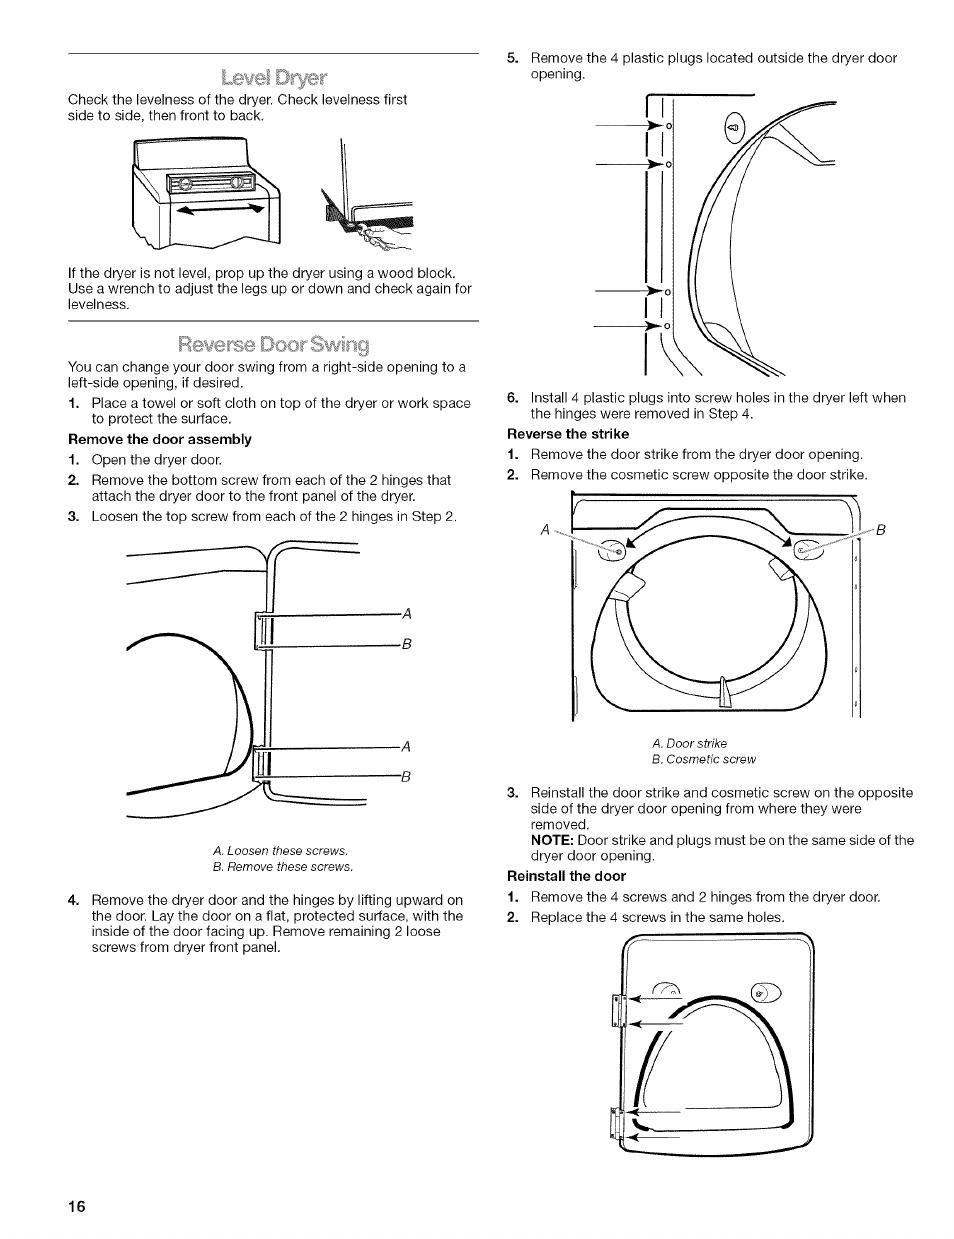 Kenmore He3 Dryer Wiring Diagram : Kenmore he dryer heating element wiring diagram electric